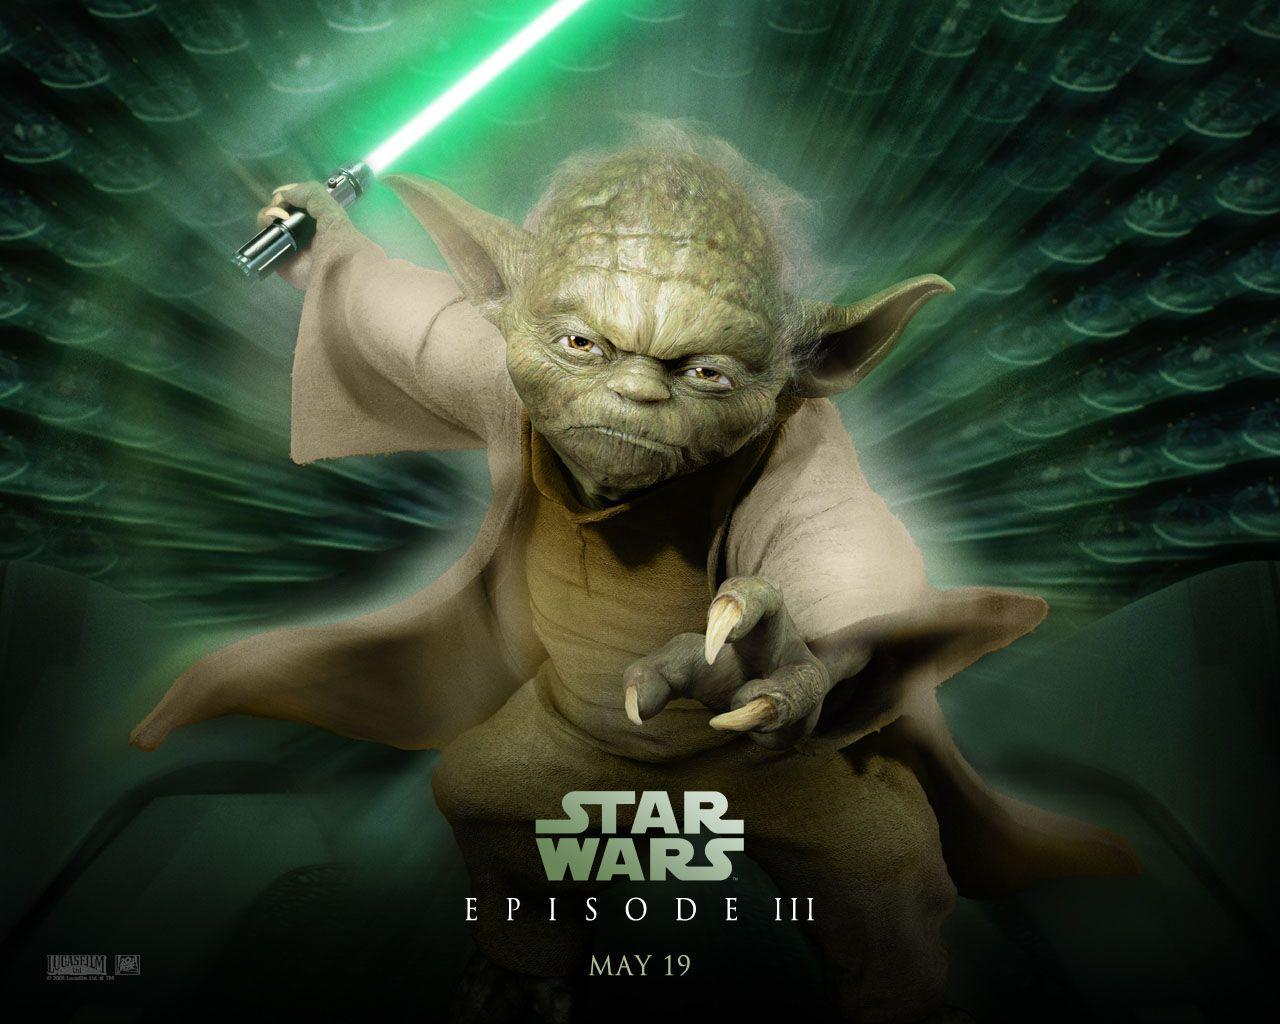 Star Wars Episode 3 Wallpaper Yoda Wallpaper Star Wars Wallpaper Star Wars Yoda